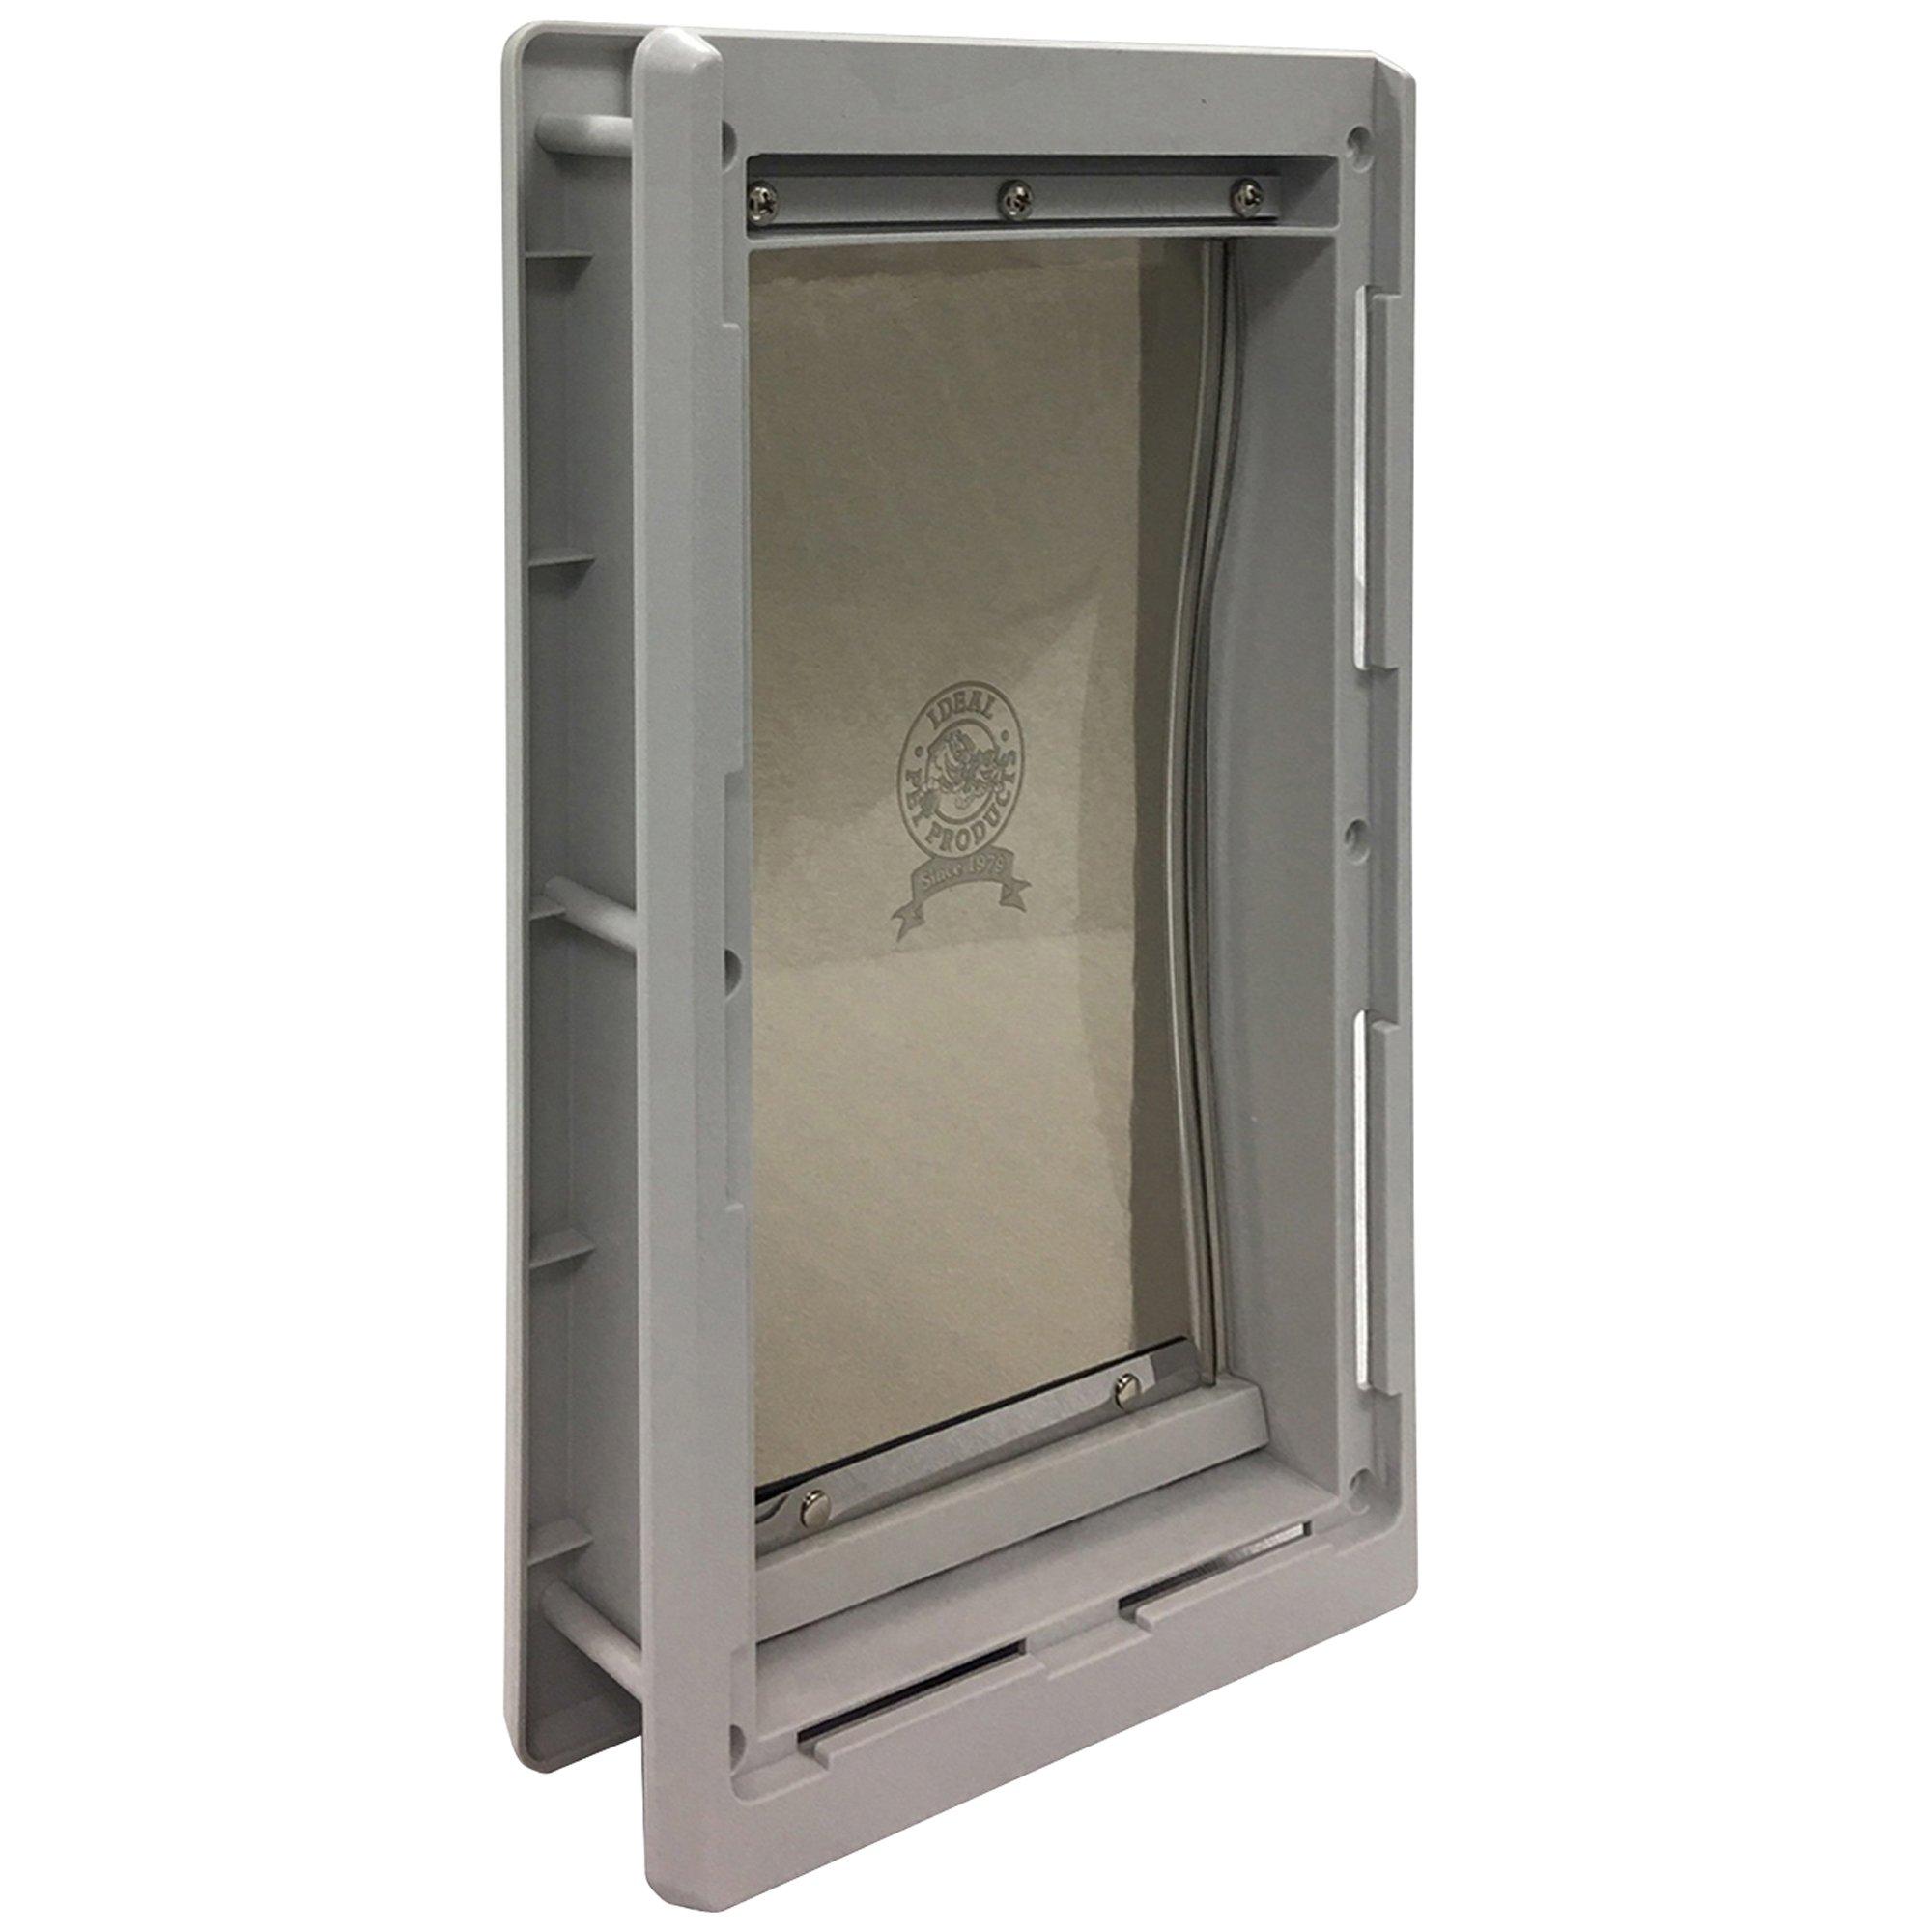 Ideal Pet Products Designer Series Plastic Pet Door with Telescoping Frame, Medium, 7'' x 11.25'' Flap Size